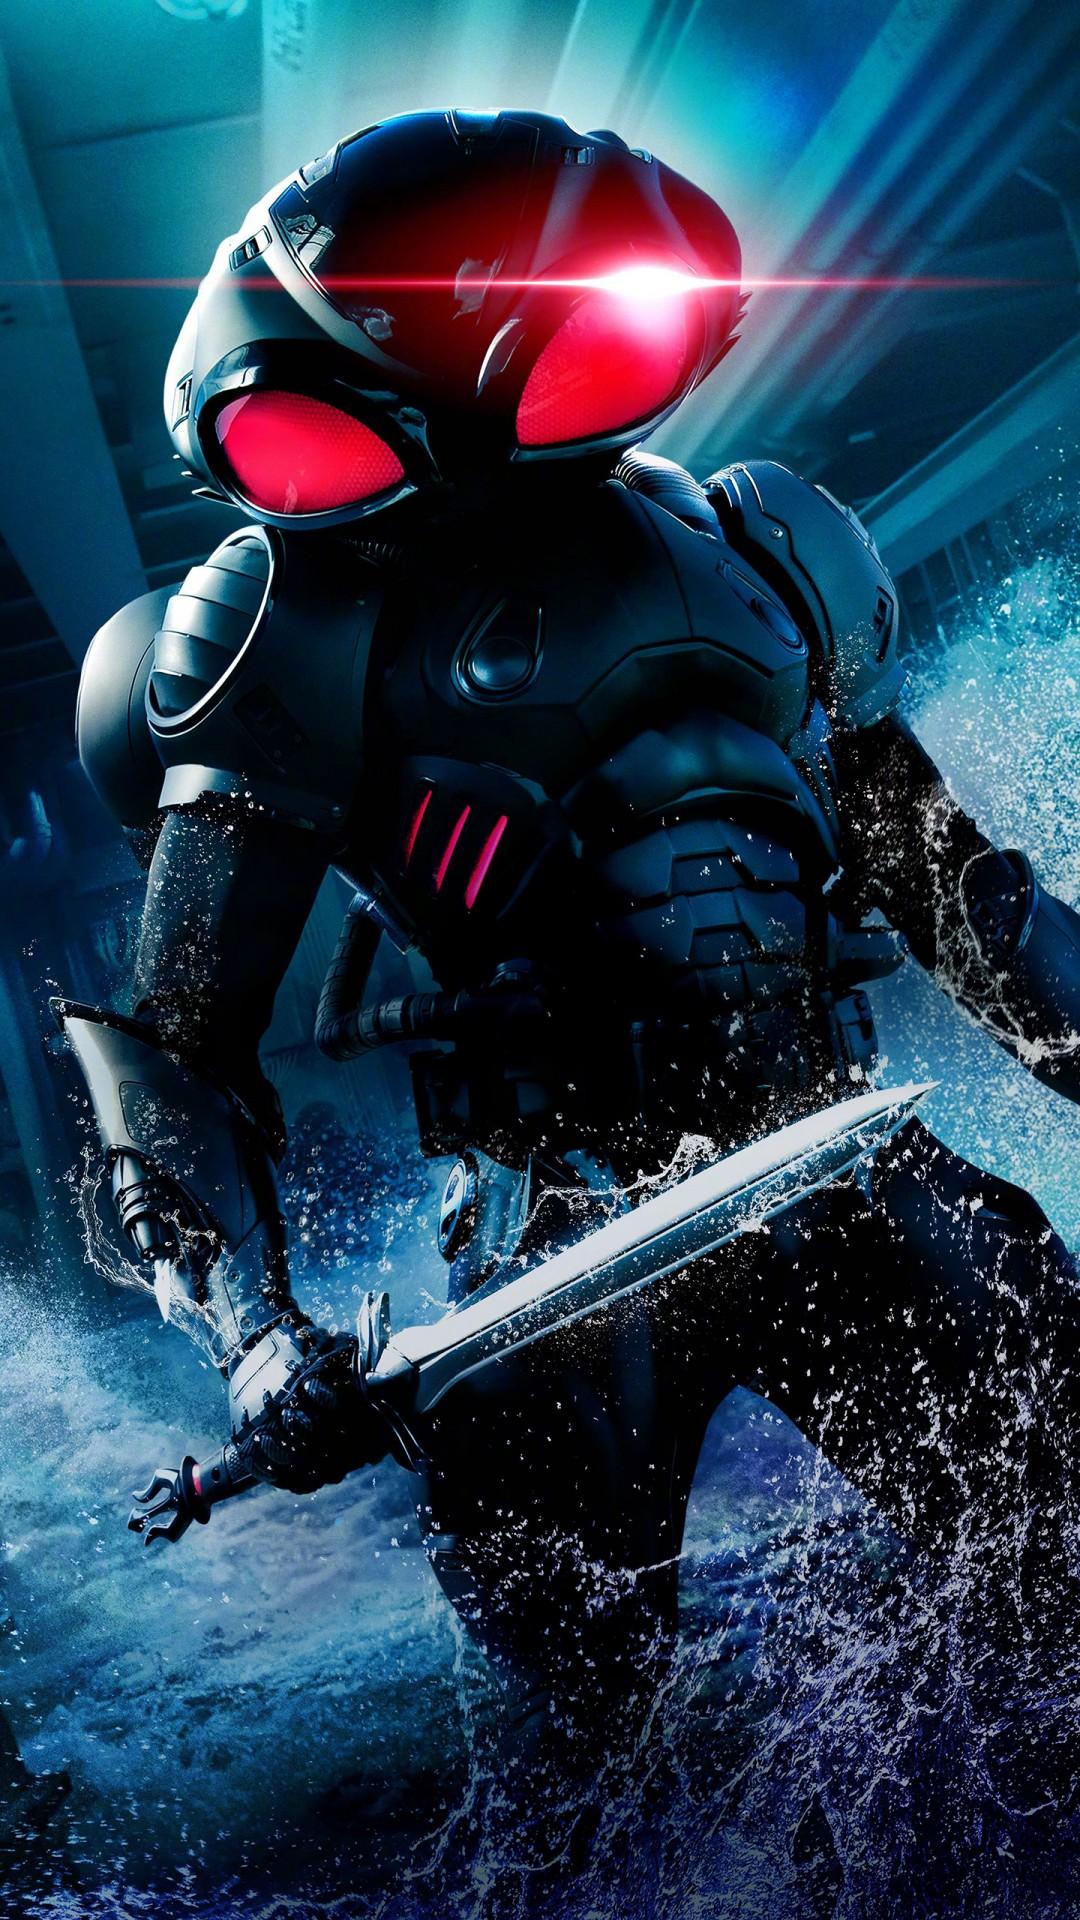 Superman Hd Iphone Wallpaper Black Manta In Aquaman Wallpapers Hd Wallpapers Id 26546